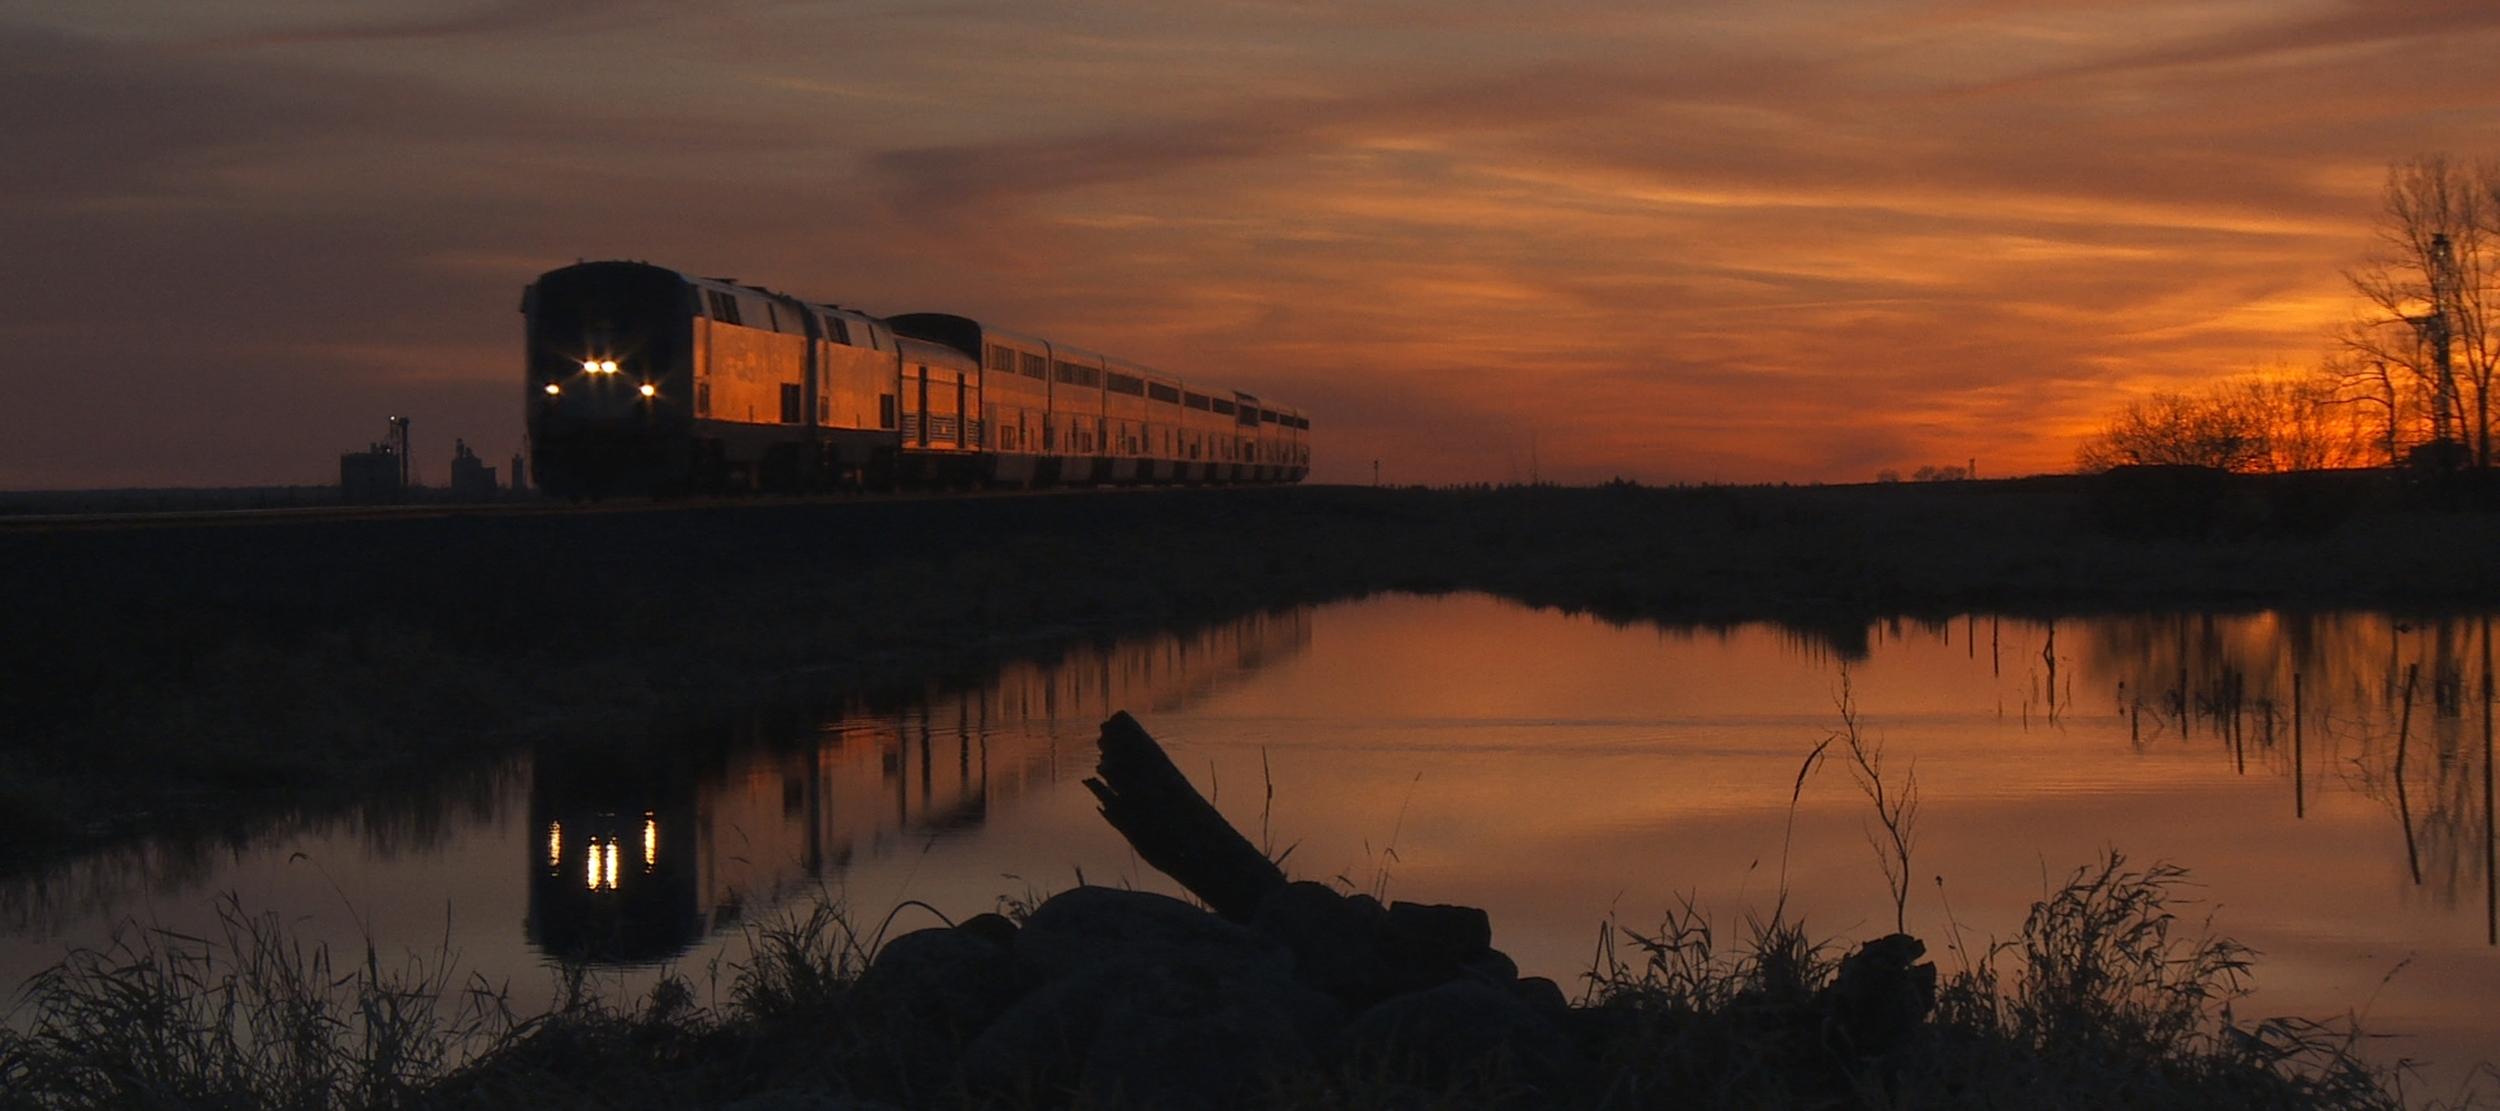 IN TRANSIT (2015) - Sunset in the plains of North Dakota